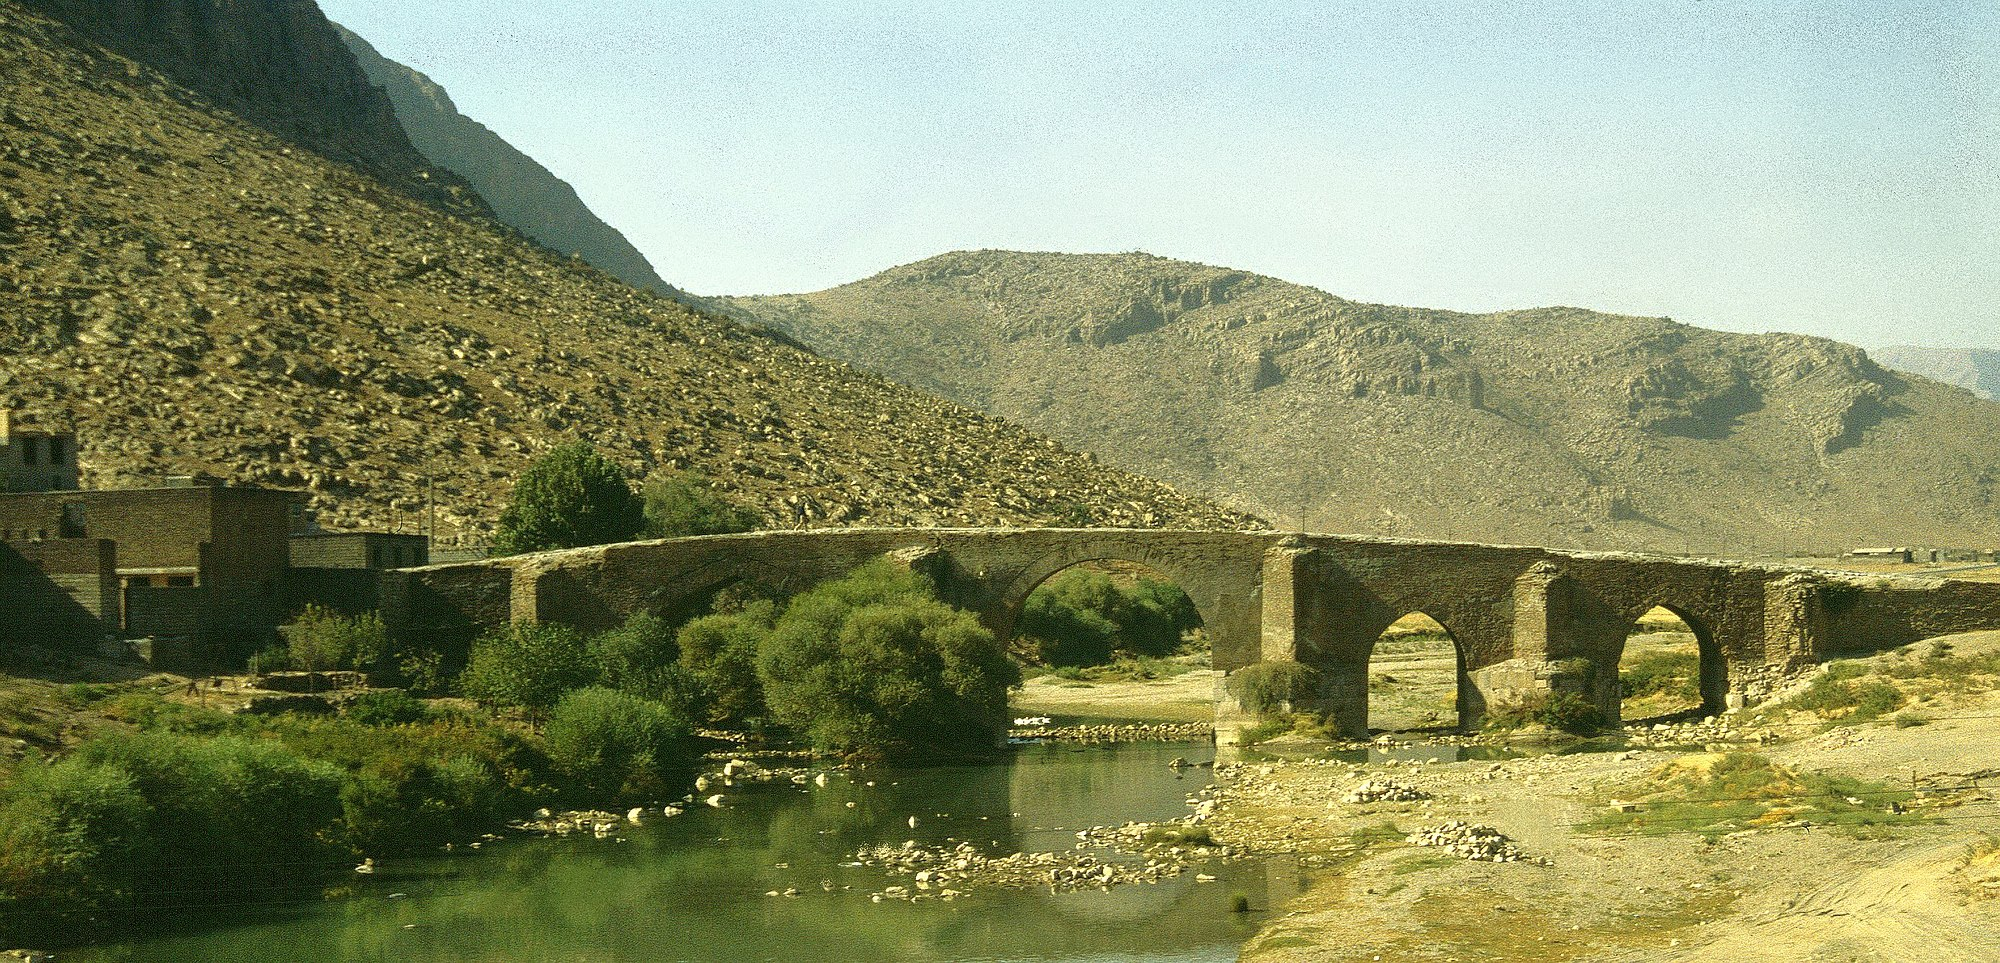 پل بیستون